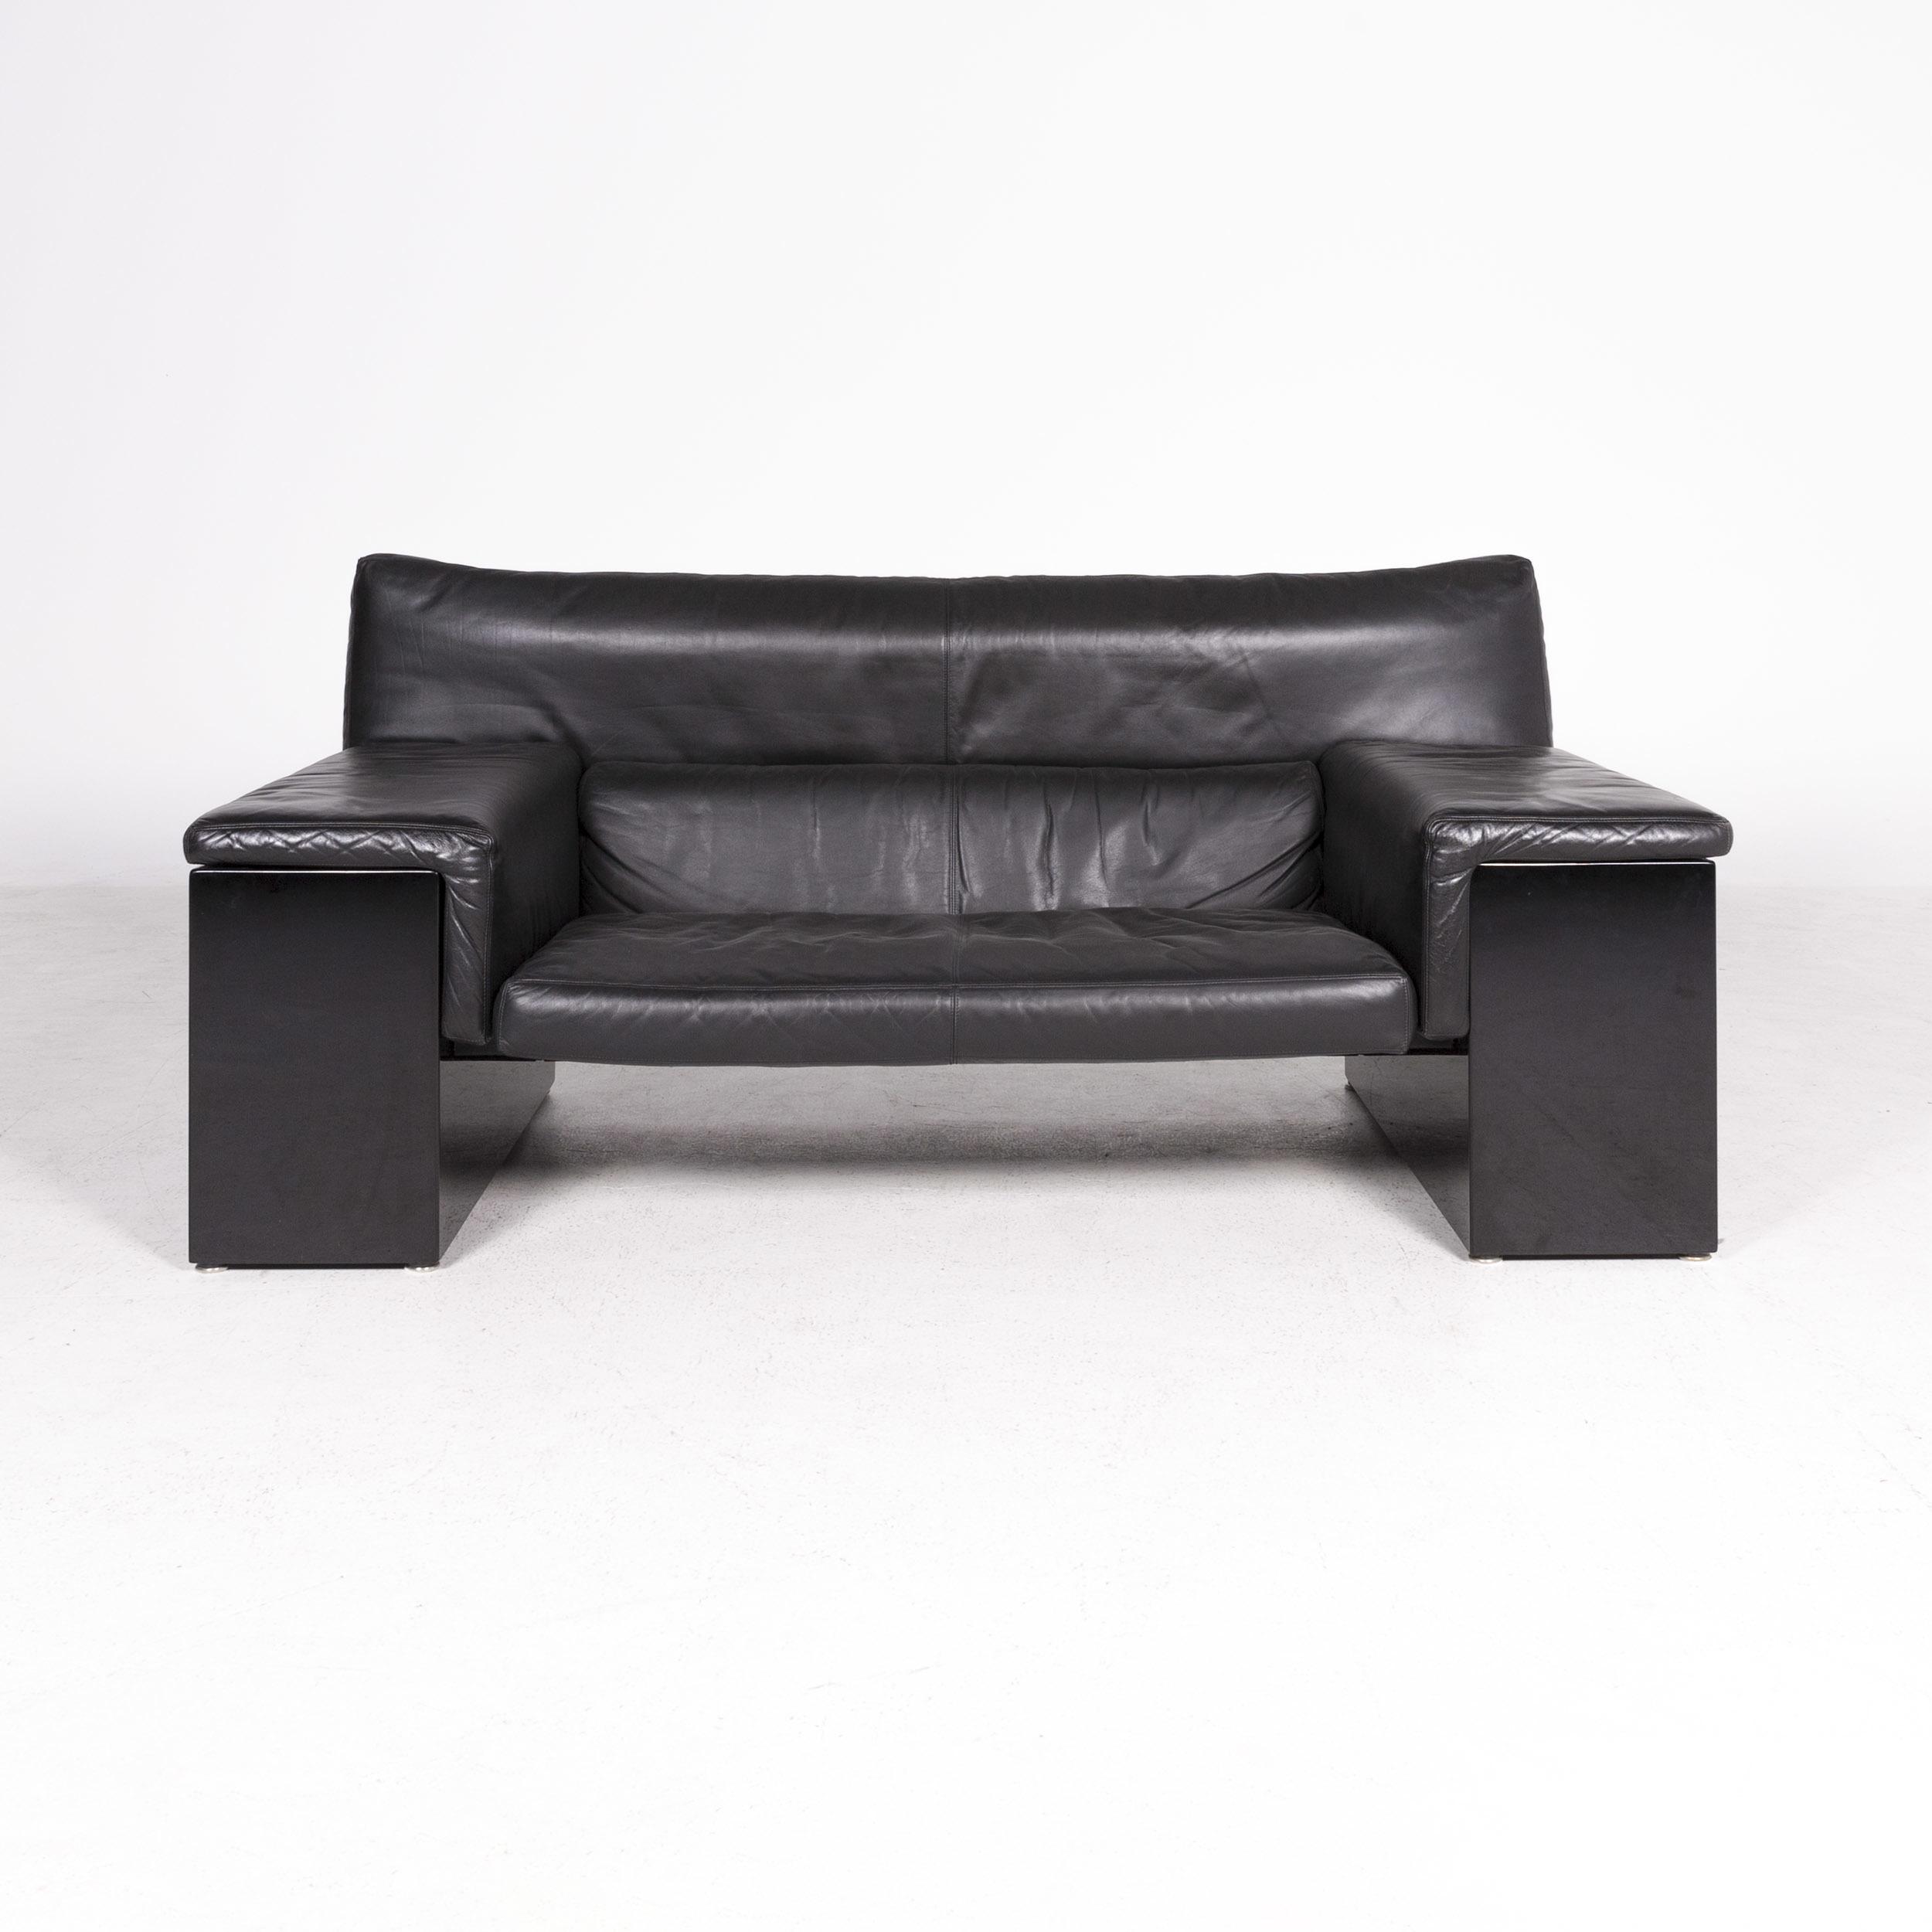 Cini Boeri Designer Leather Sofa